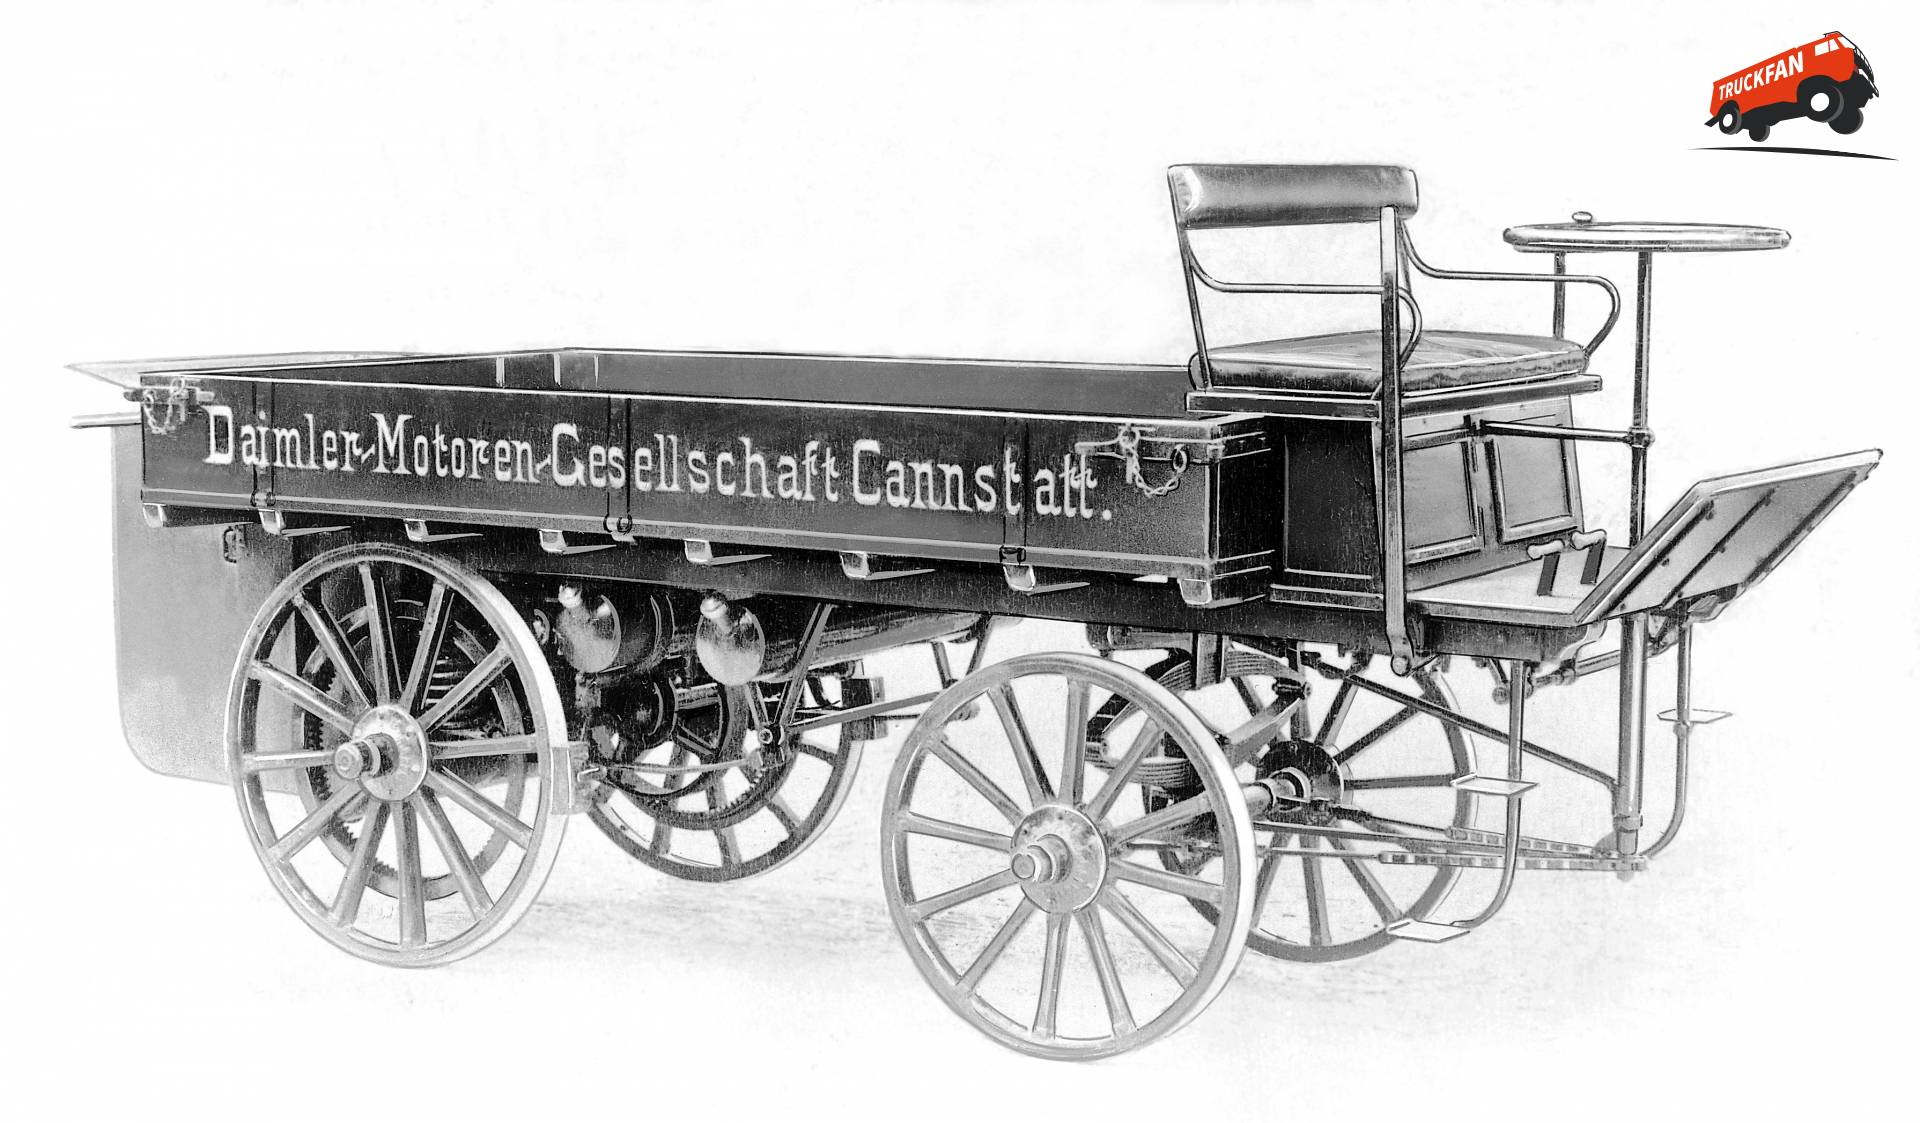 Daimler Motor-Lastwagen